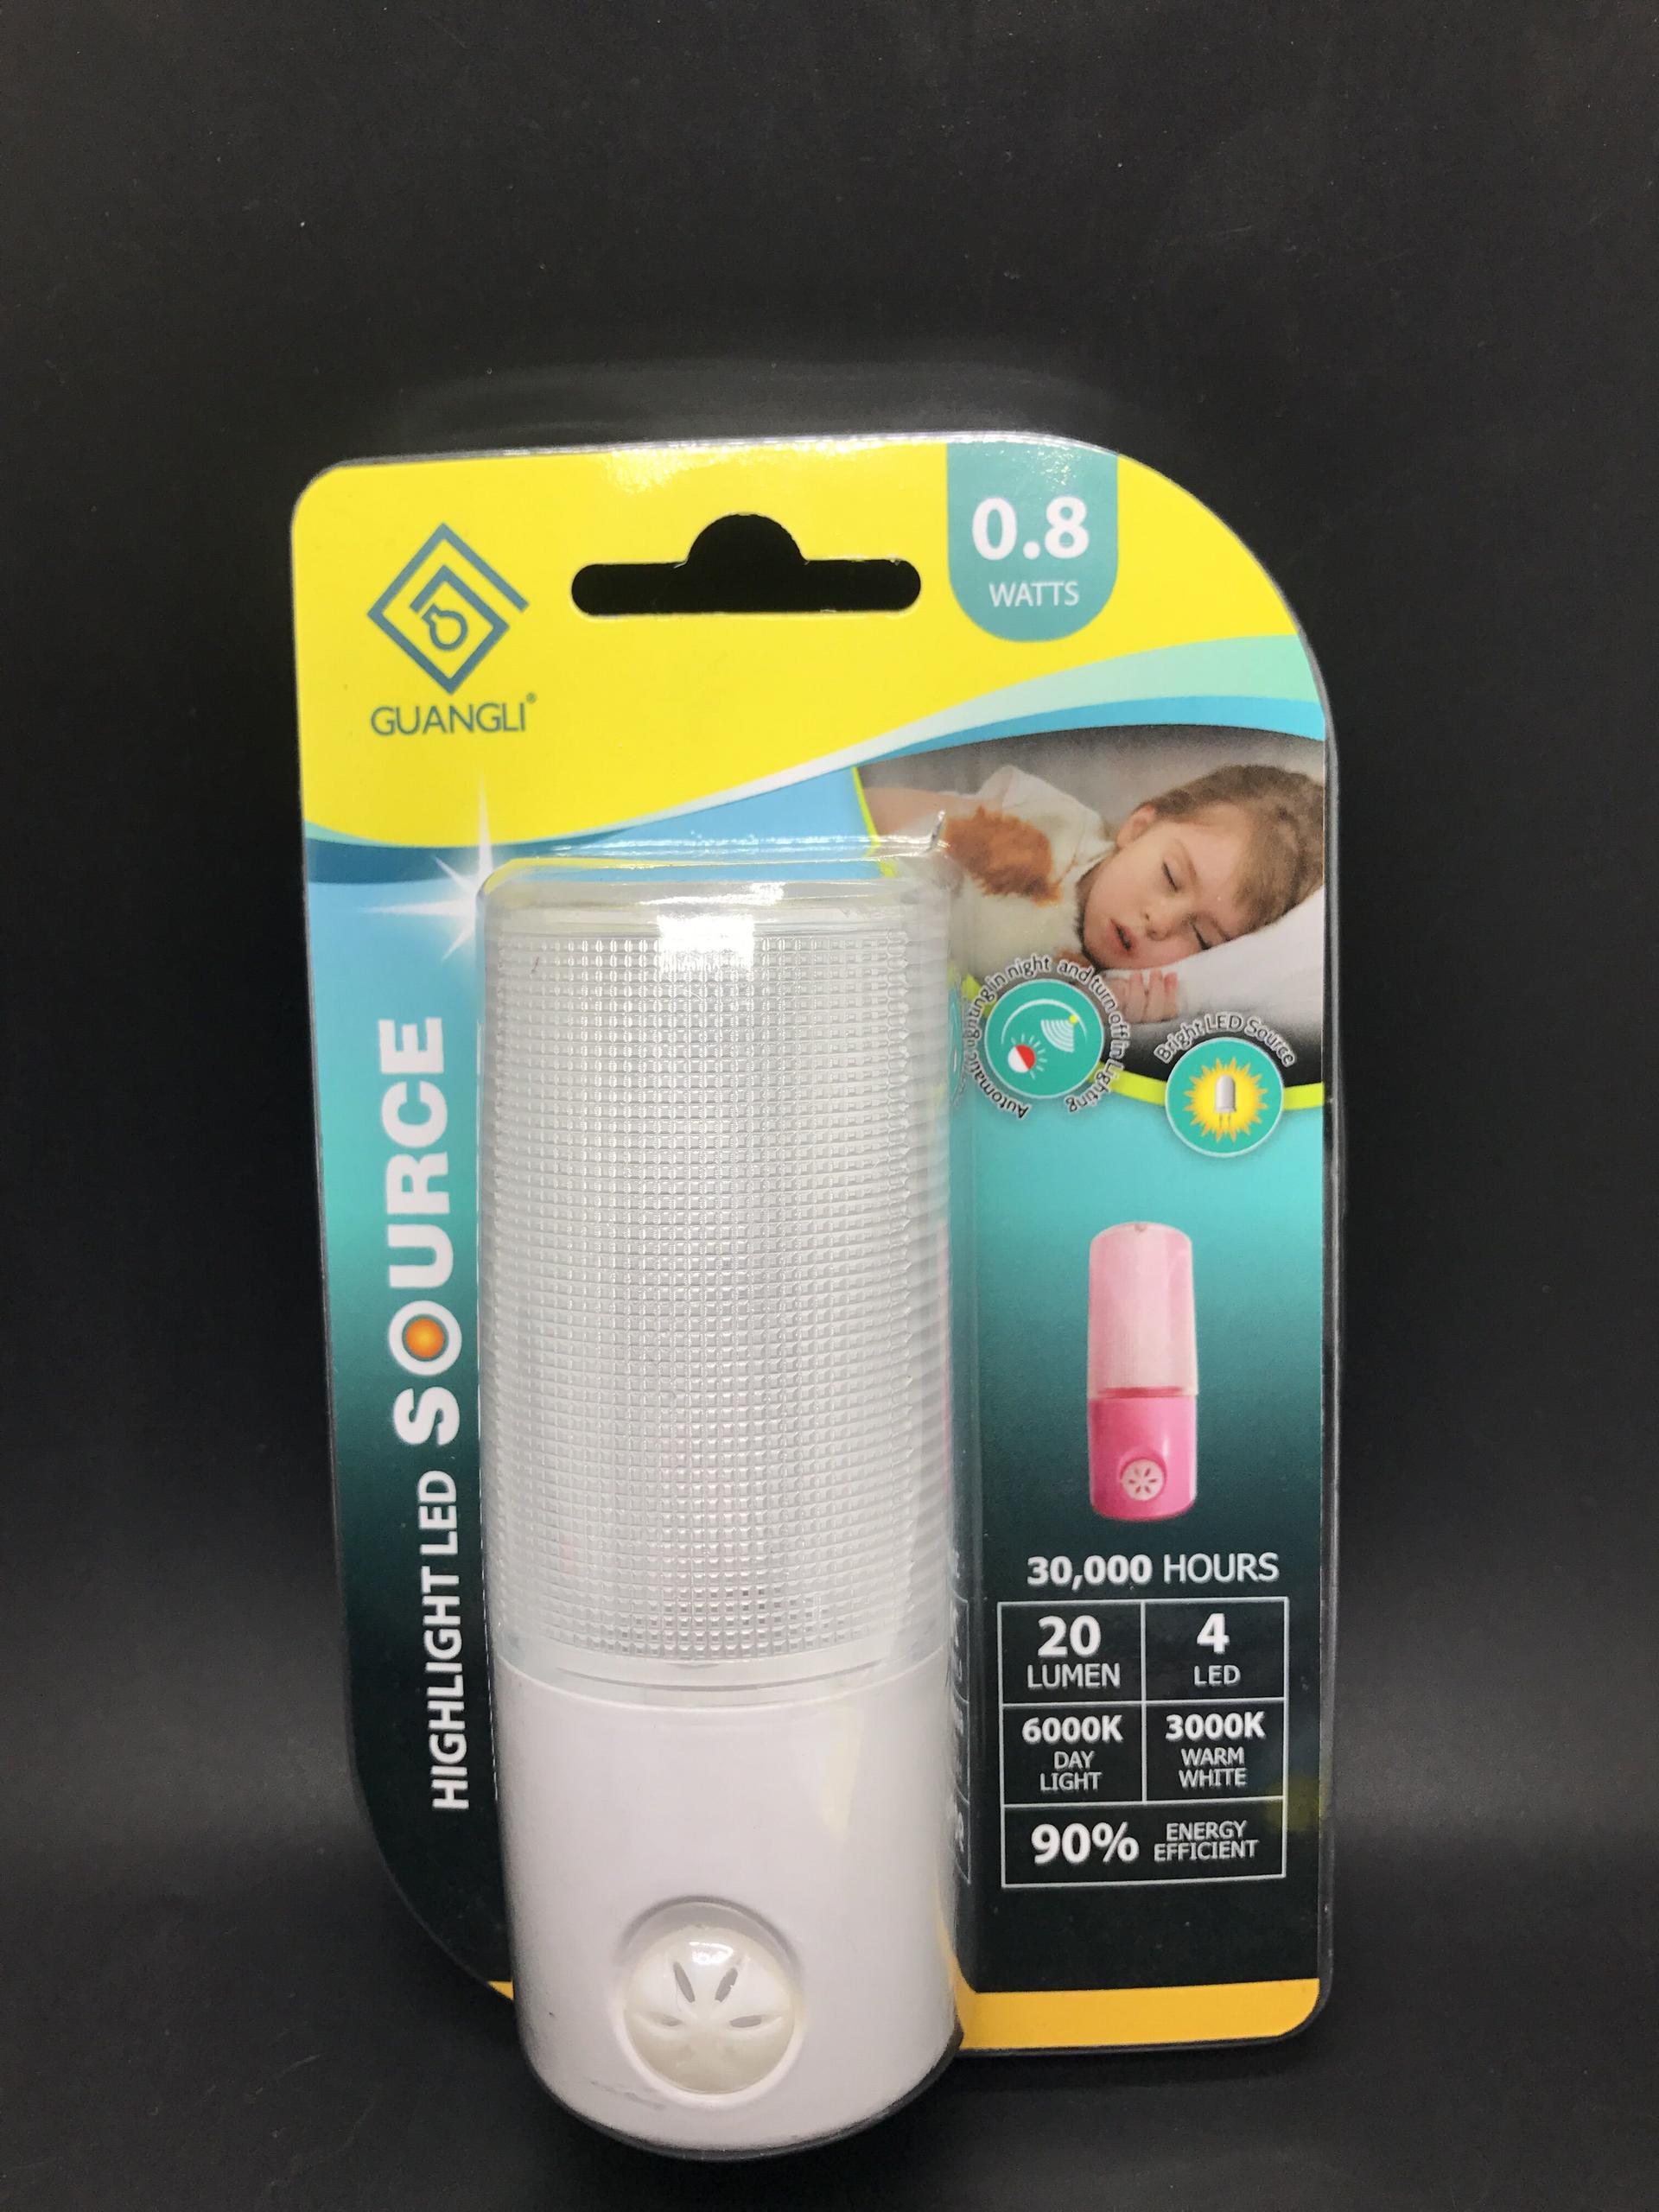 A86 OEM Dusk to Dawn Sensor Cool White BS EU Plug in led sensor night light Low Energy for kids bedroom hallway